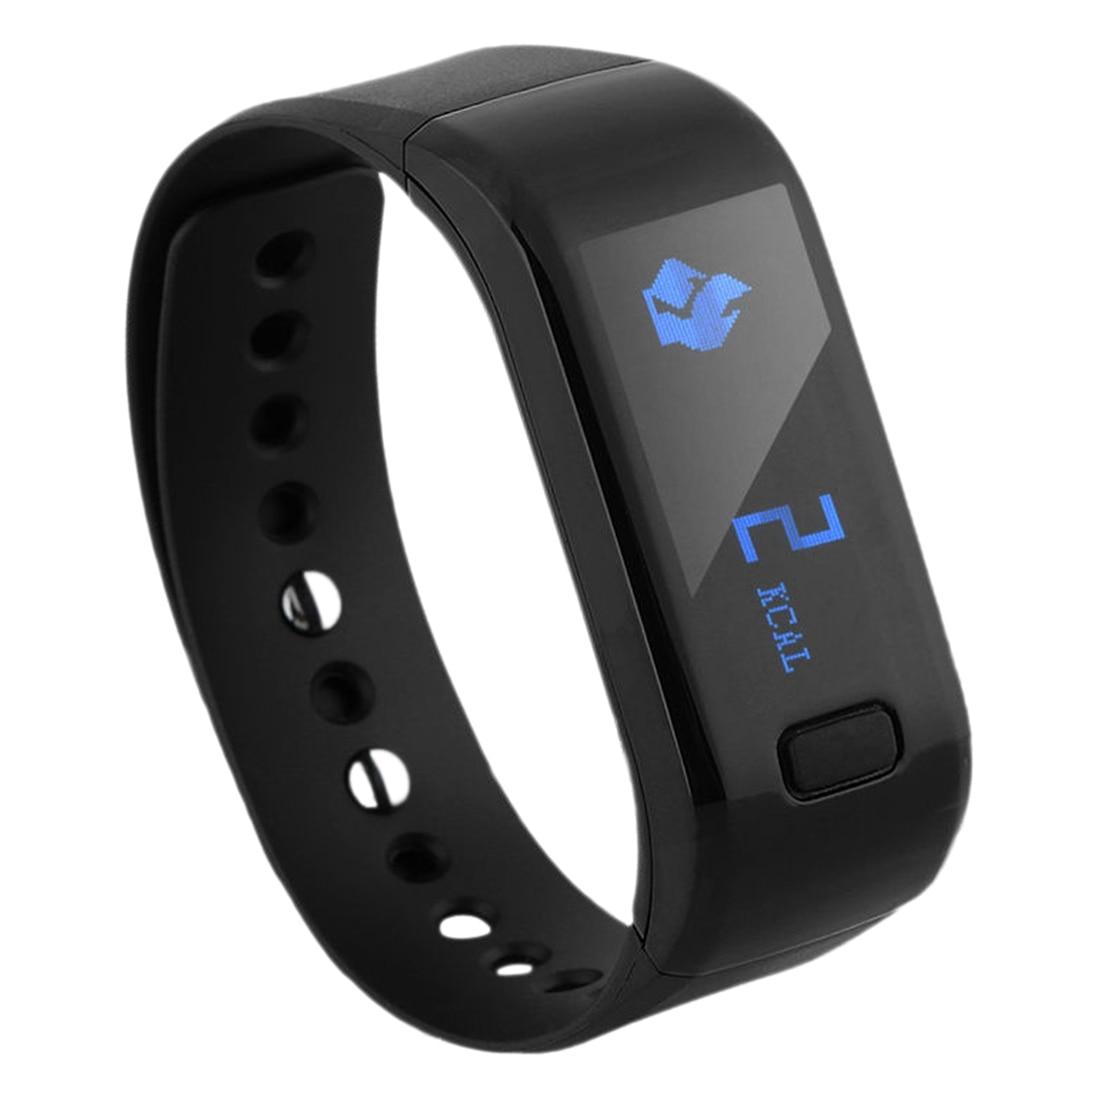 Bluetooth Health Wristband Sport Activity Tracker Sleep Monitor Band Smart Watch Black